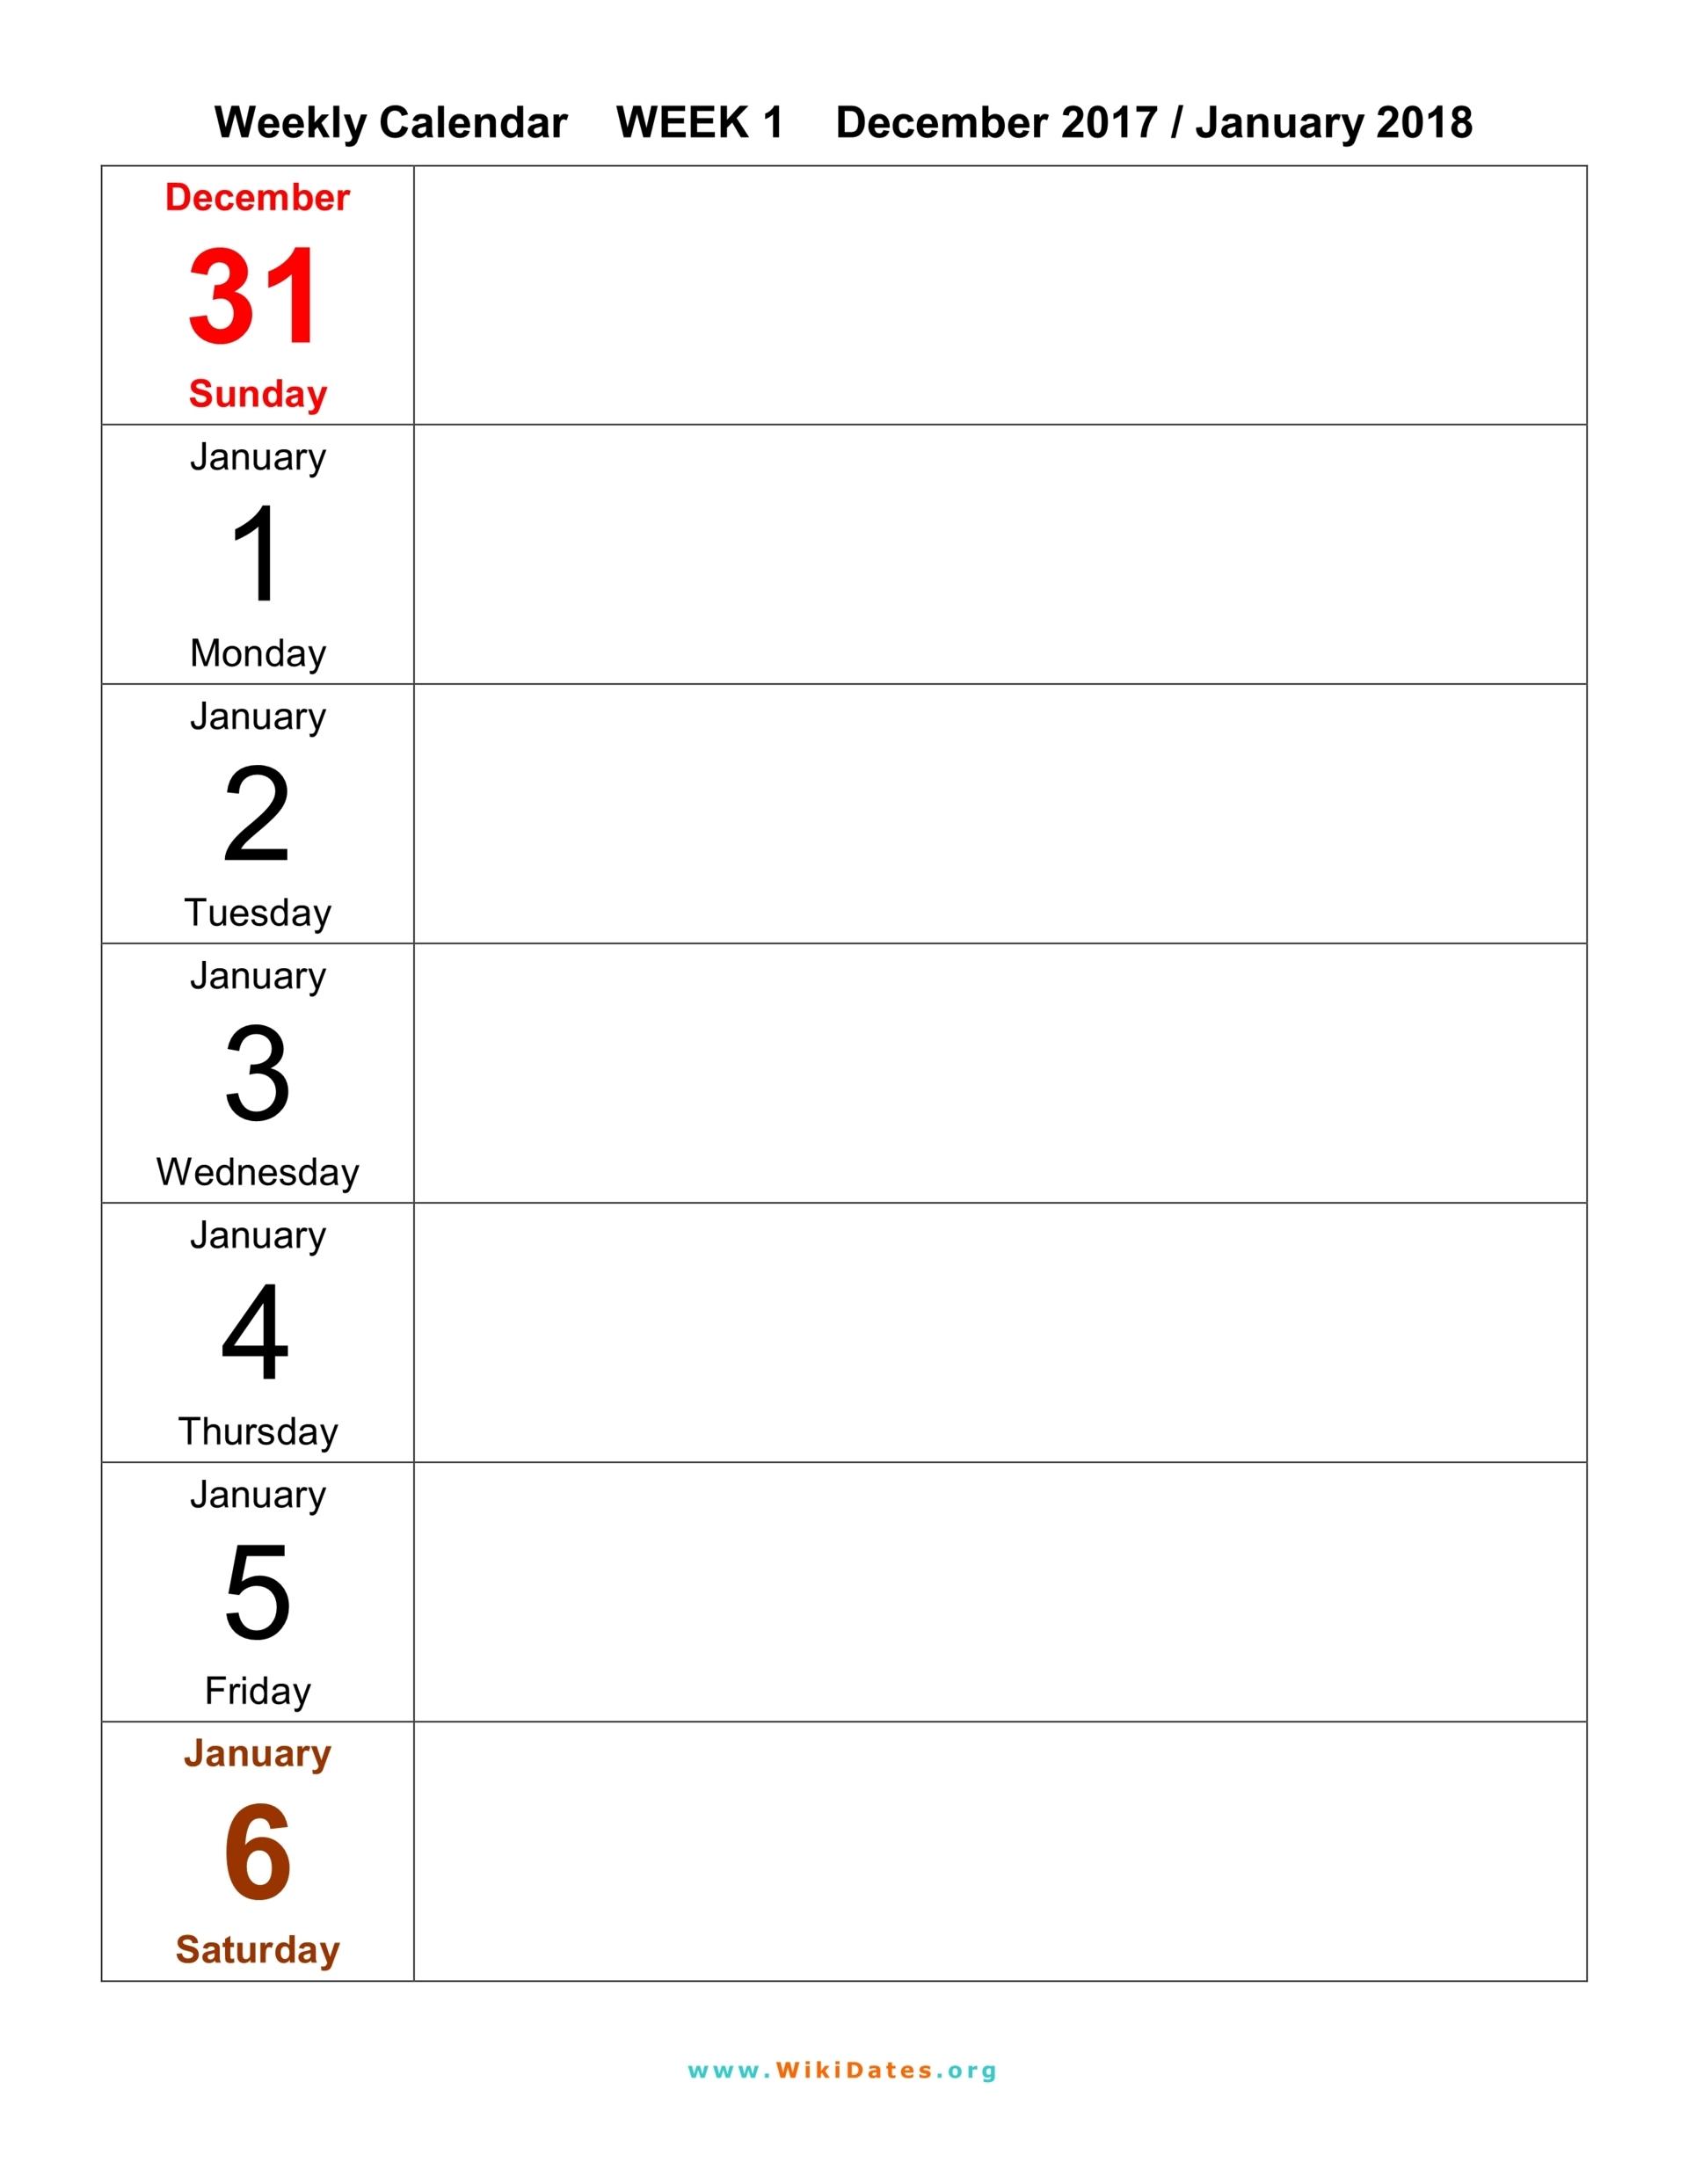 Weekly Calendar Template 2018 : Weekly calendar download and